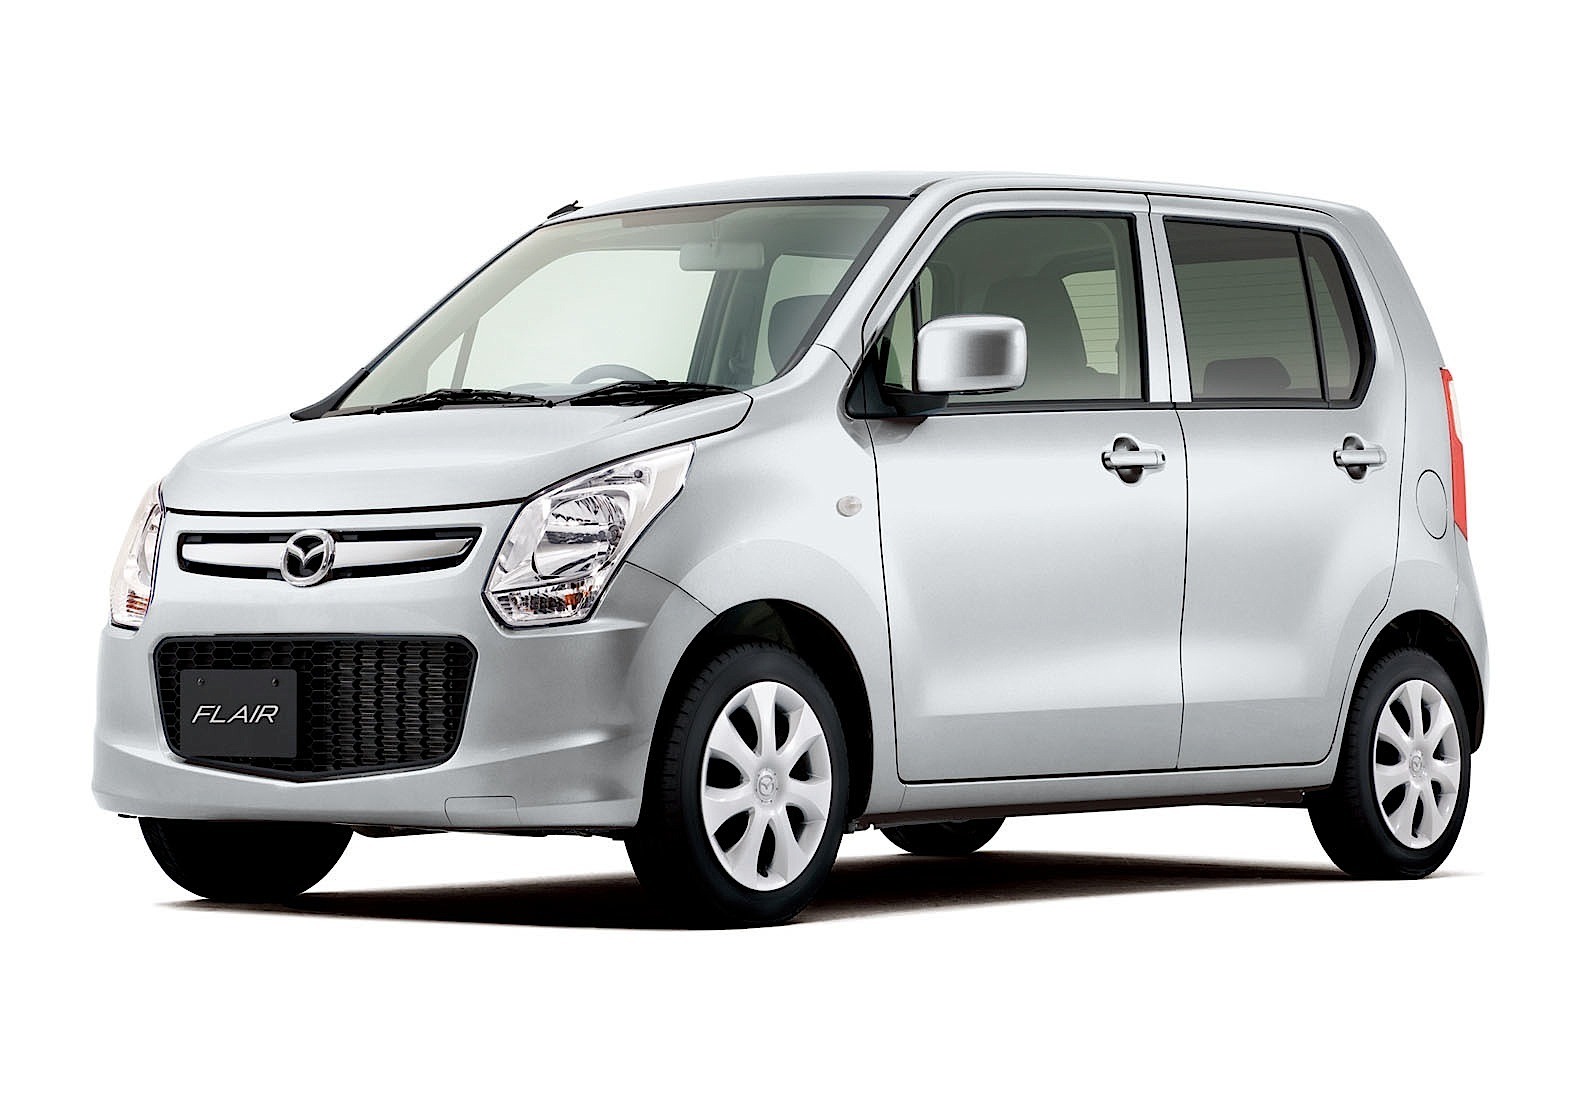 Mazda Flair I 2012 - 2014 Microvan #7